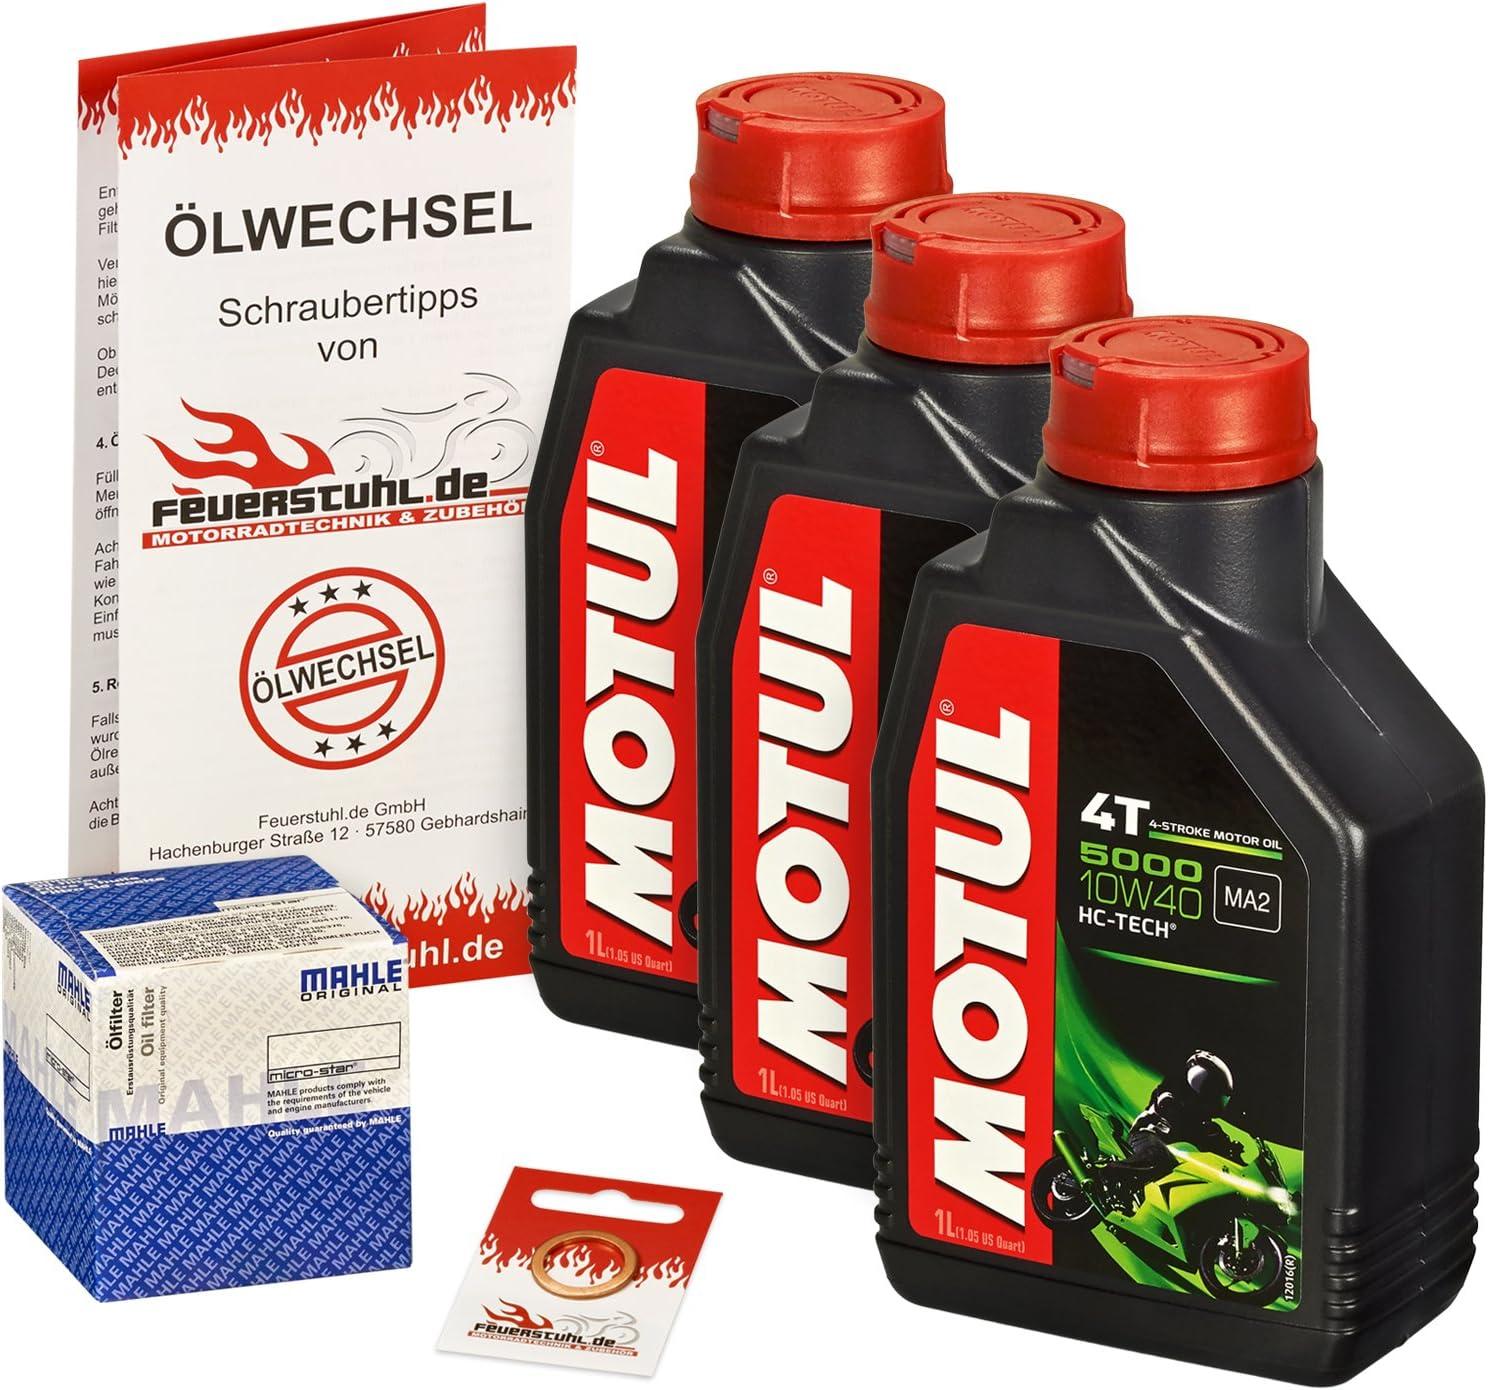 Motul 10w 40 Öl Mahle Ölfilter Für Yamaha Mt 09 Alle Modelle 13 15 Rn29 Ölwechselset Inkl Motoröl Filter Dichtring Auto